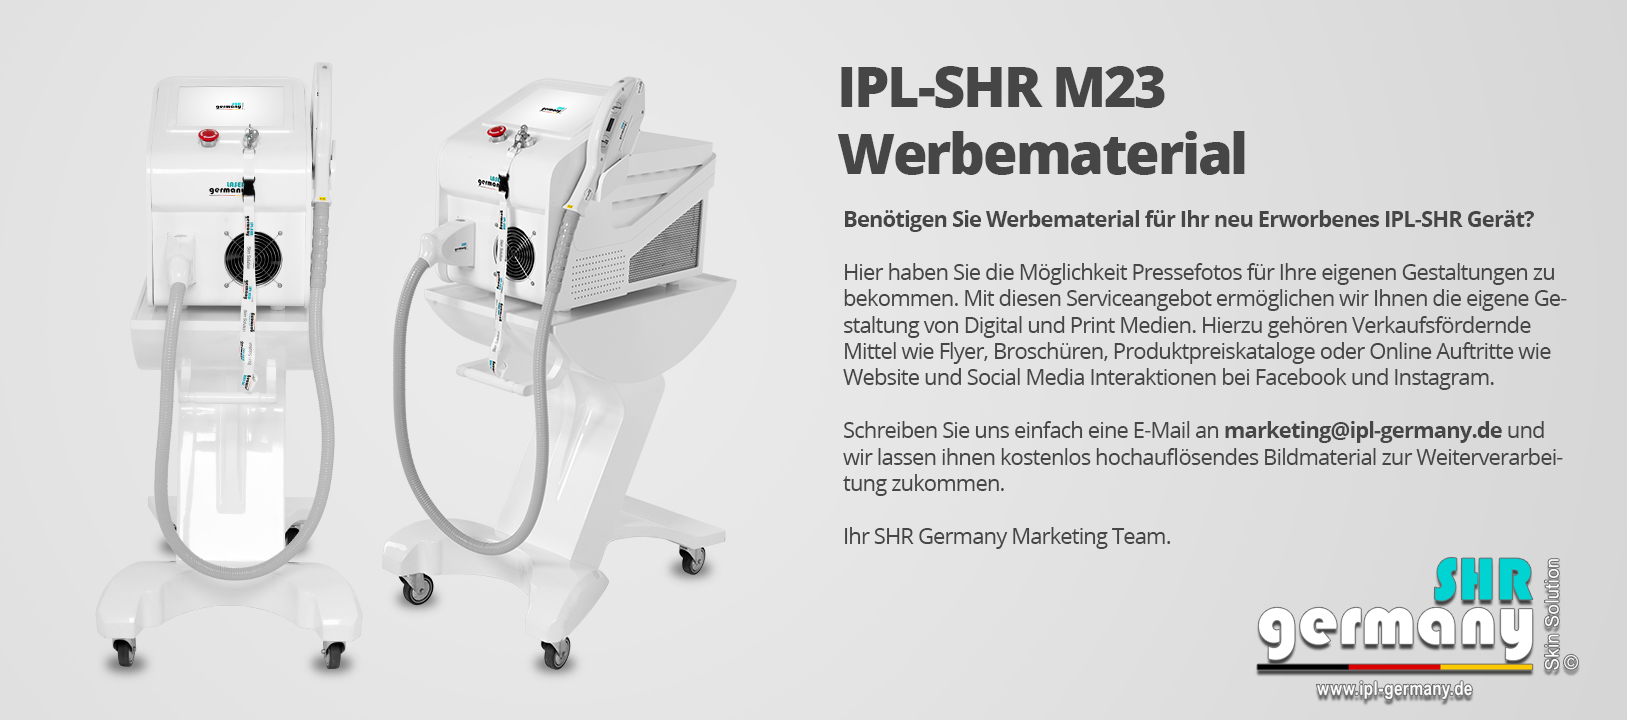 SHR_Germany_IPL_M23_Werbematerial